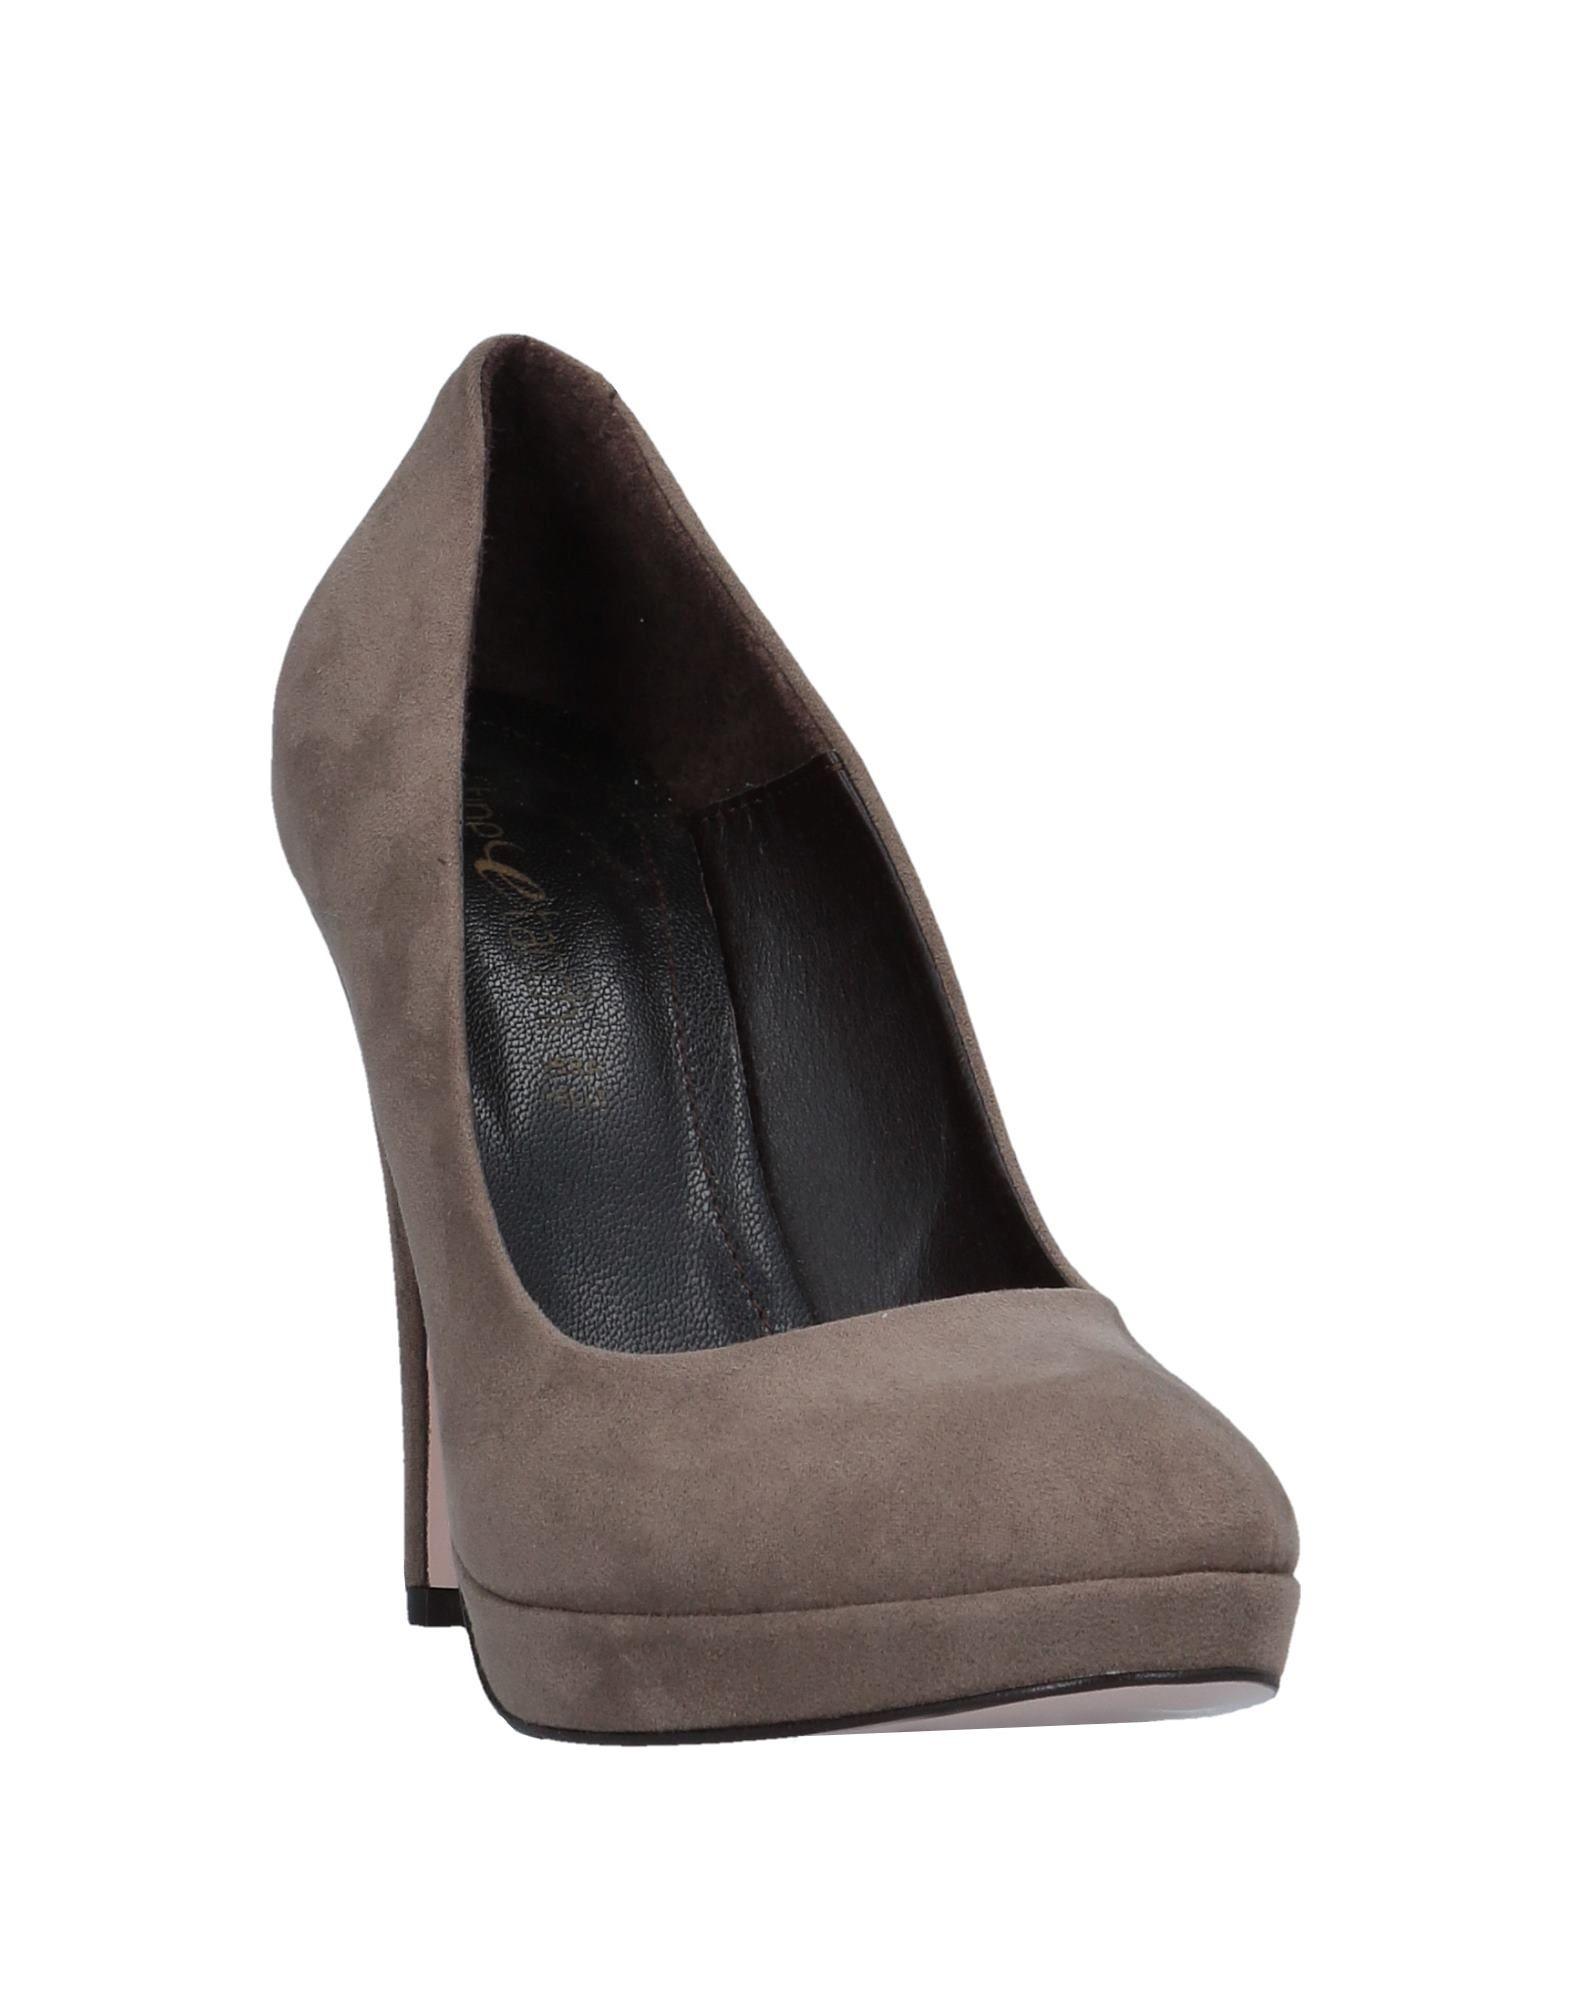 Tipe E Tacchi Qualität Pumps Damen  11533054VV Gute Qualität Tacchi beliebte Schuhe 85d309